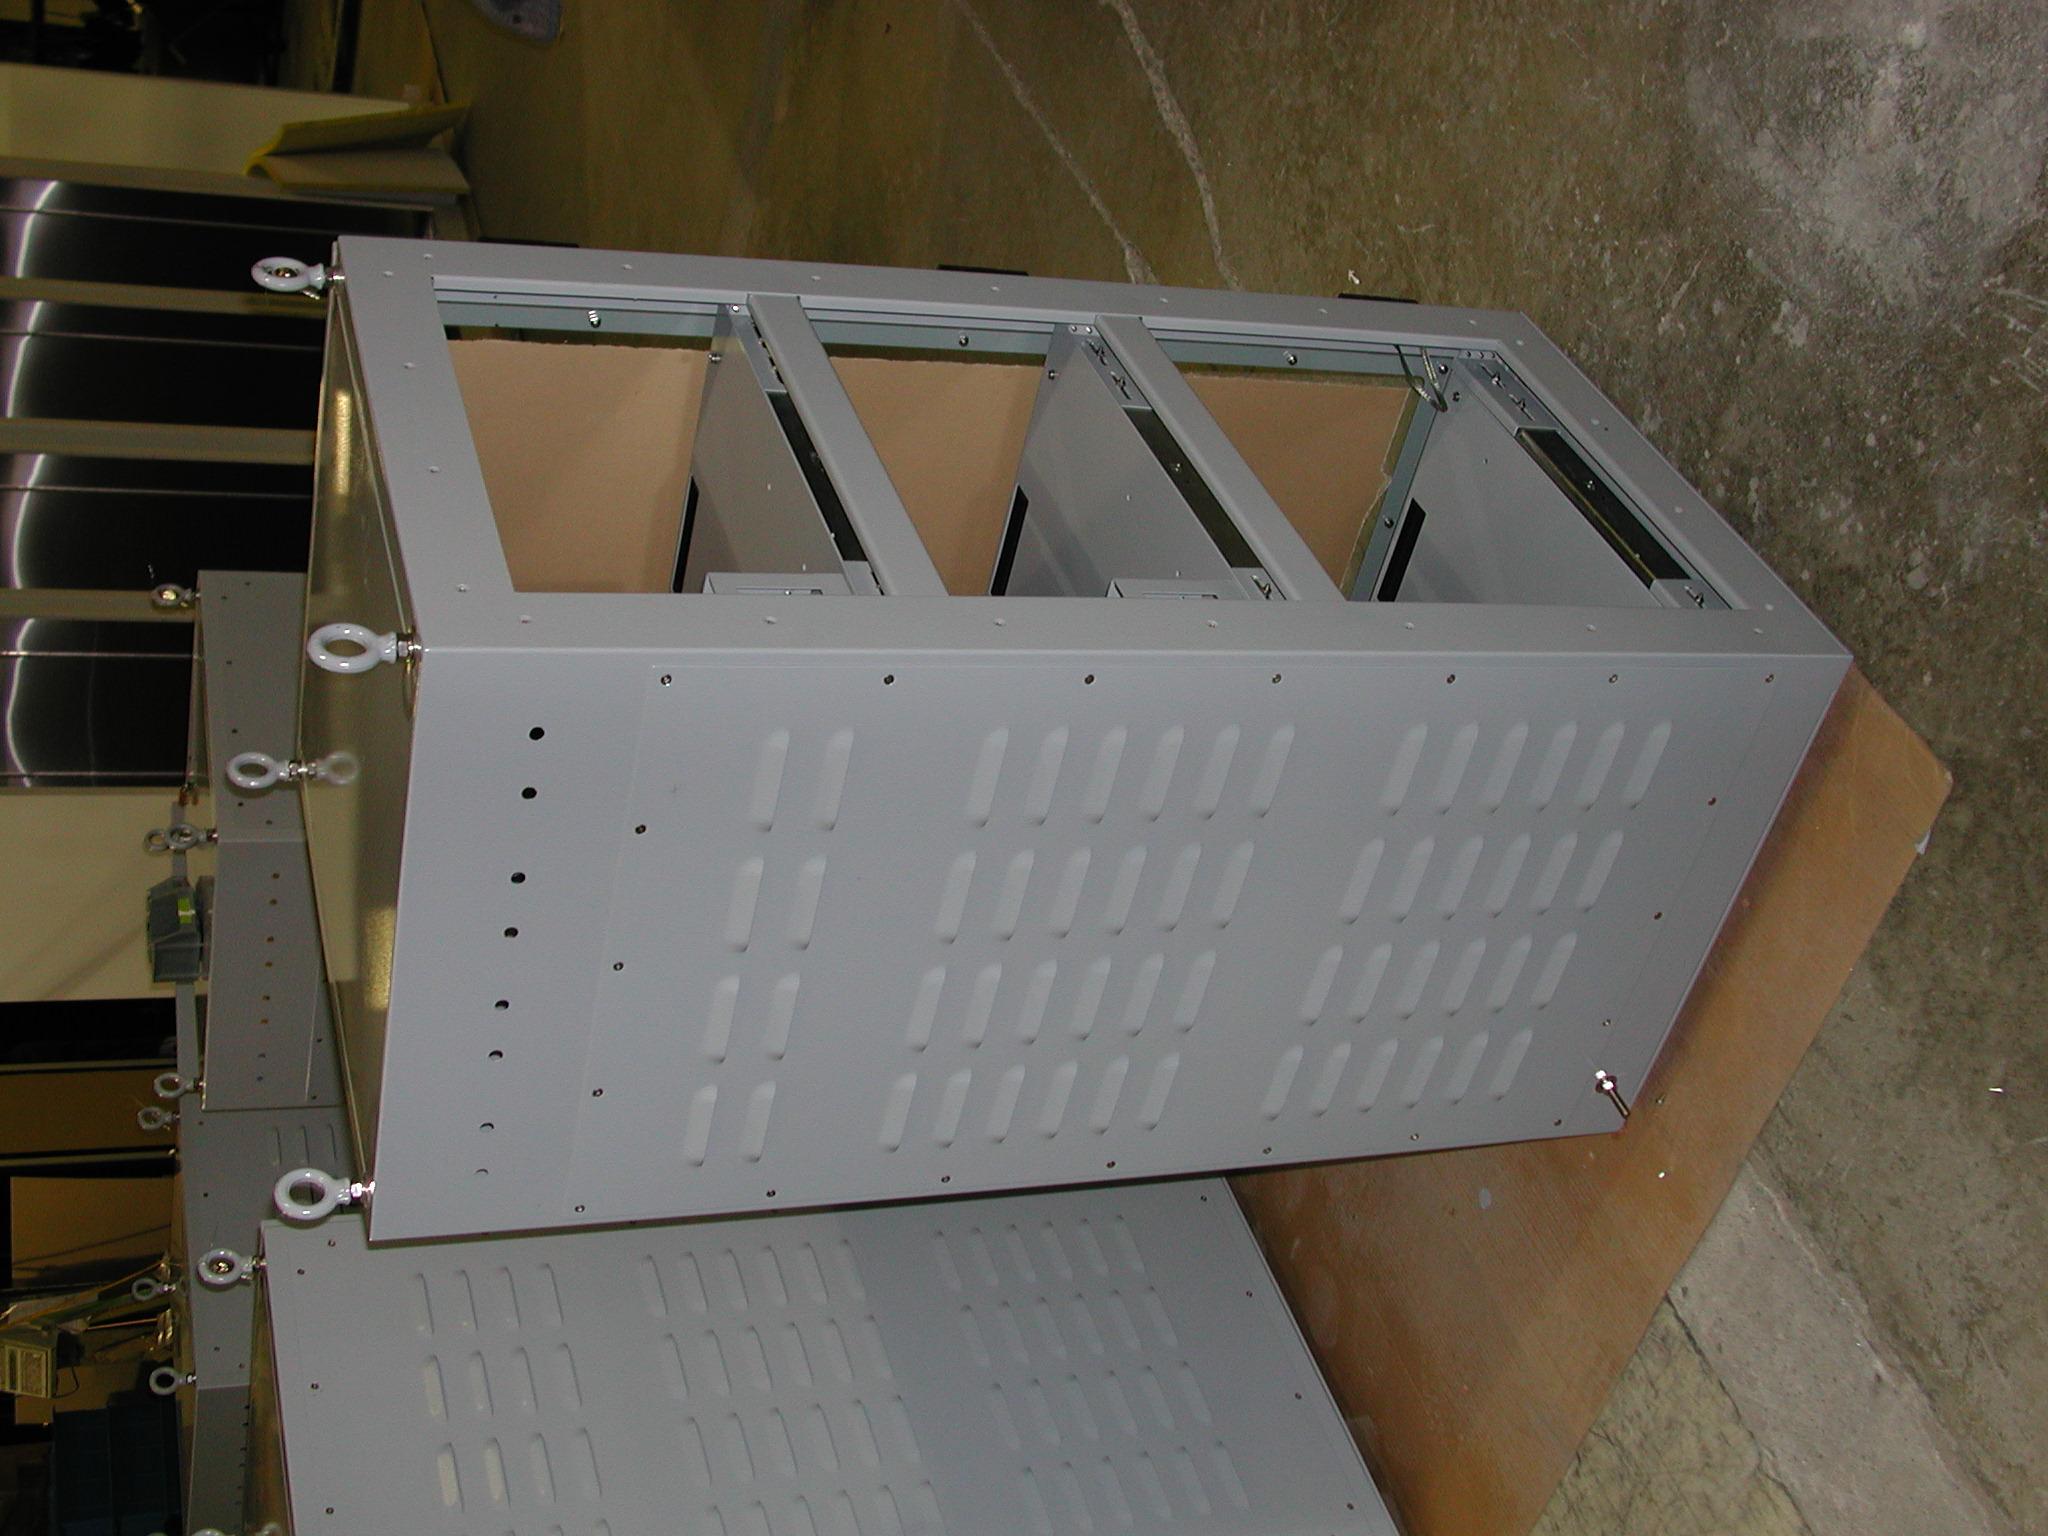 Metal Enclosures Millitary Hopewell Precision NY DSCN1631.JPG